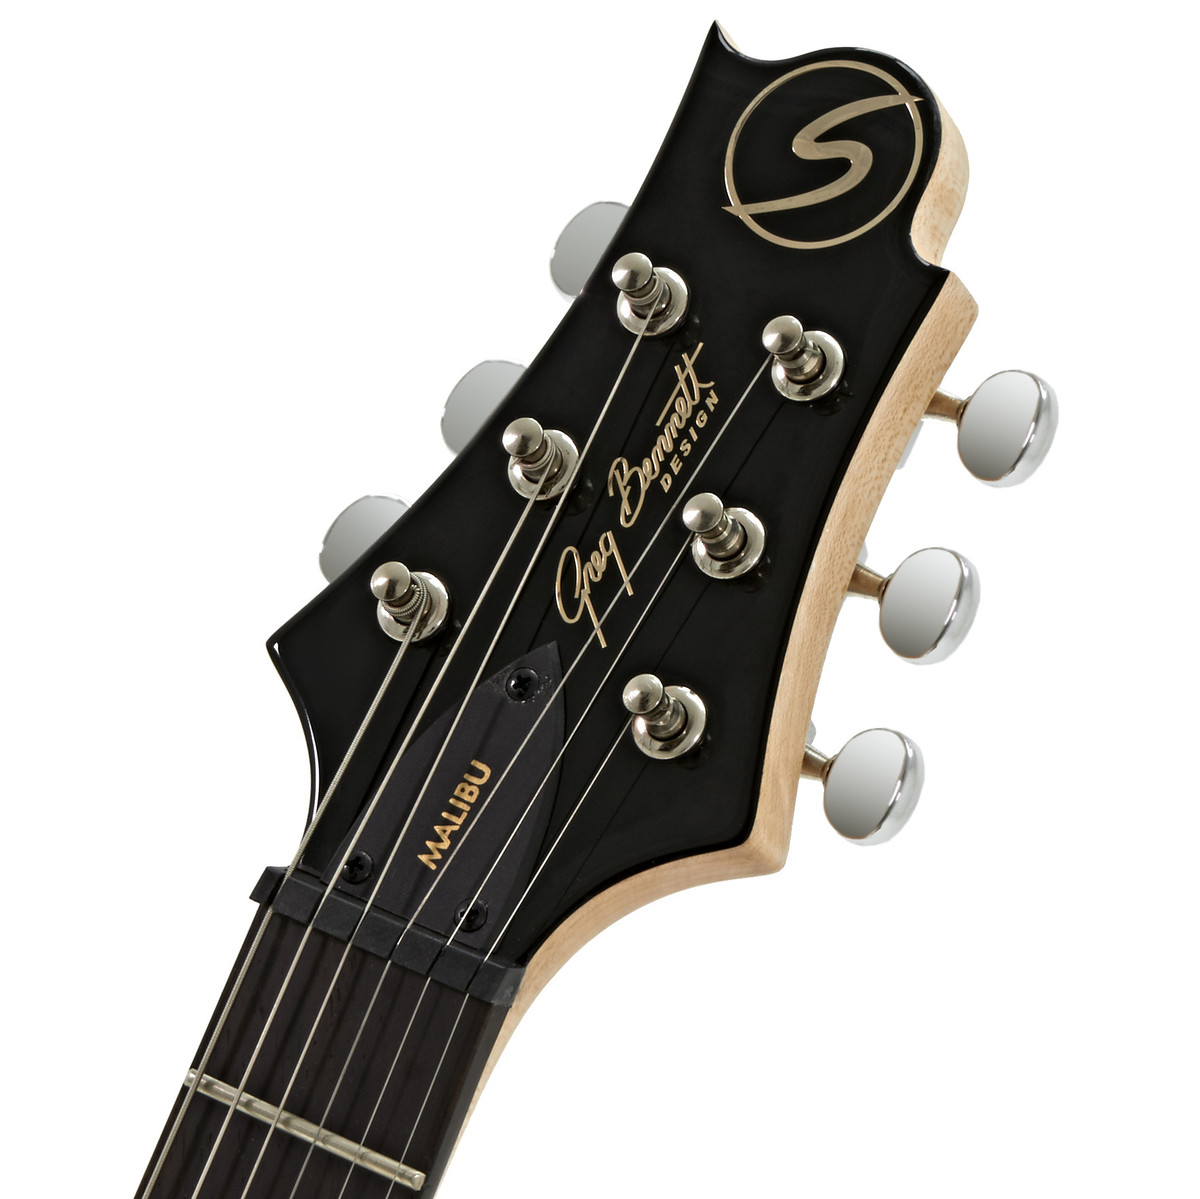 puis greg bennett malibu mmb 1 mini guitare lectrique rouge. Black Bedroom Furniture Sets. Home Design Ideas